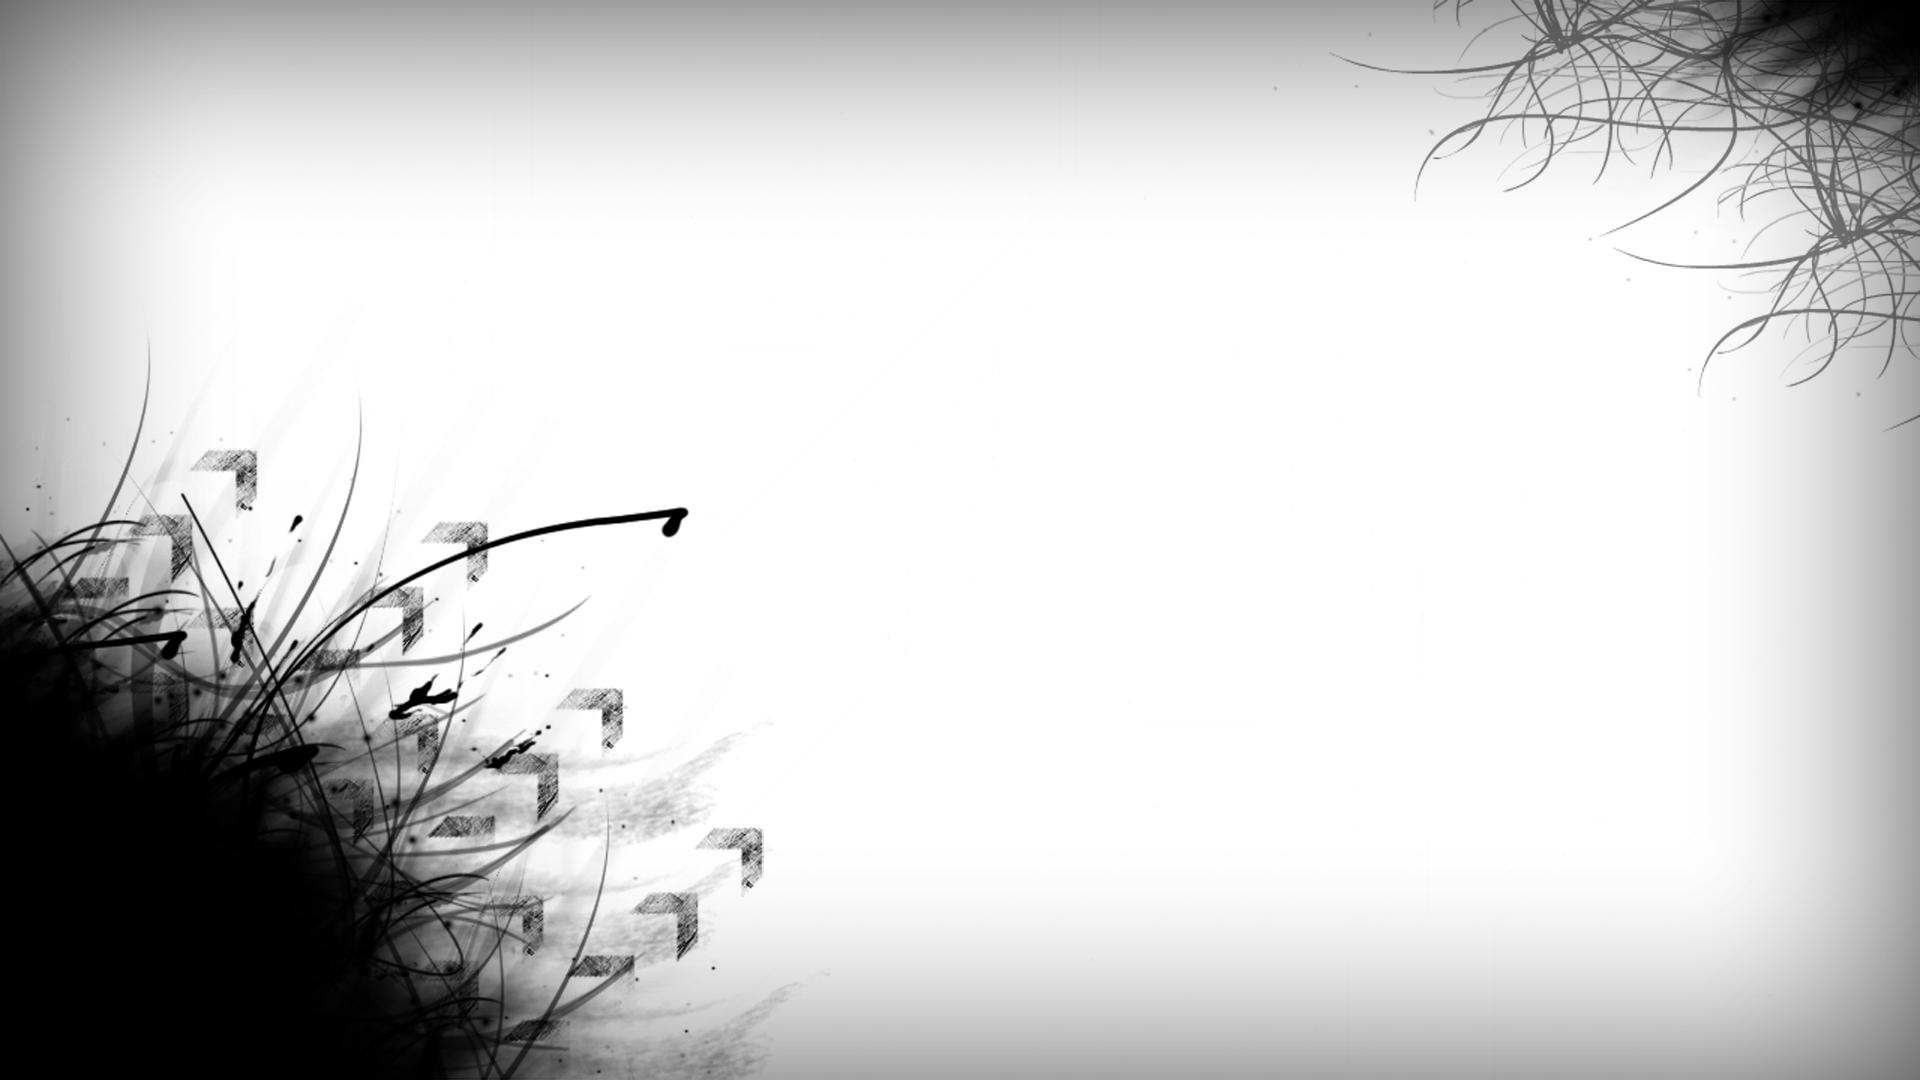 black and white wallpaper by yeikosv on deviantart